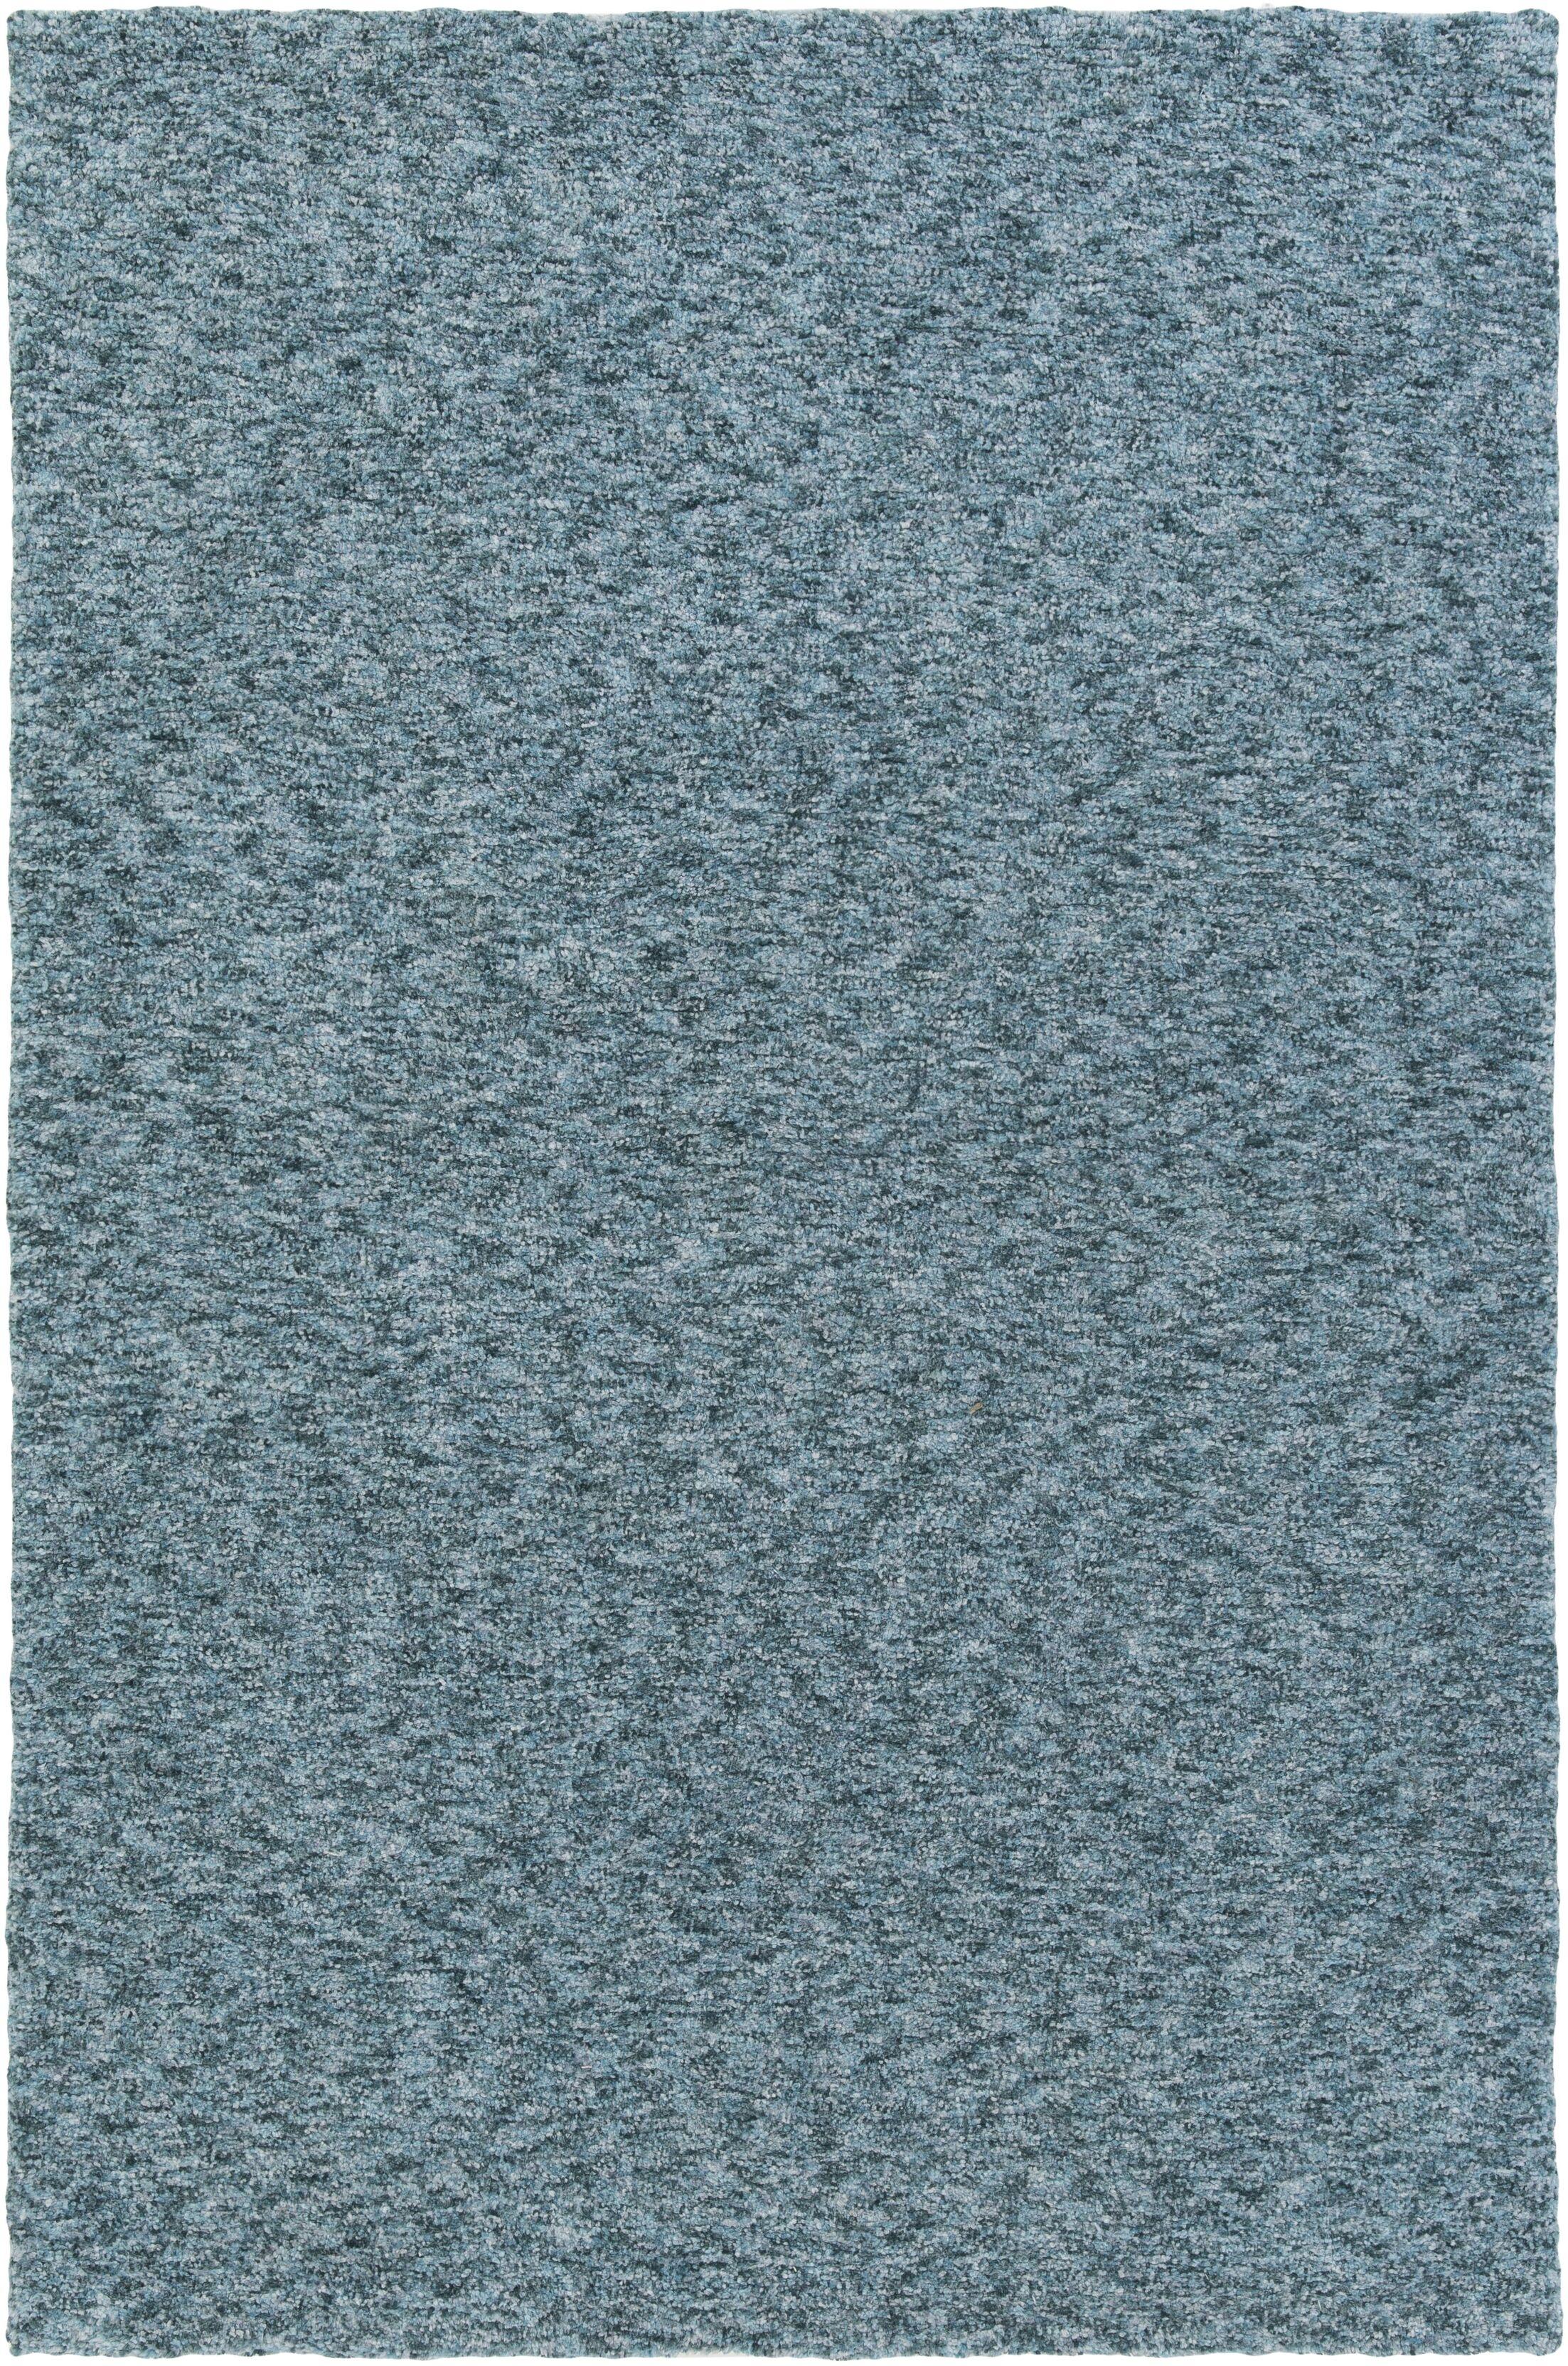 Daub Navy/Light Blue Area Rug Rug Size: Rectangle 5' x 7'6